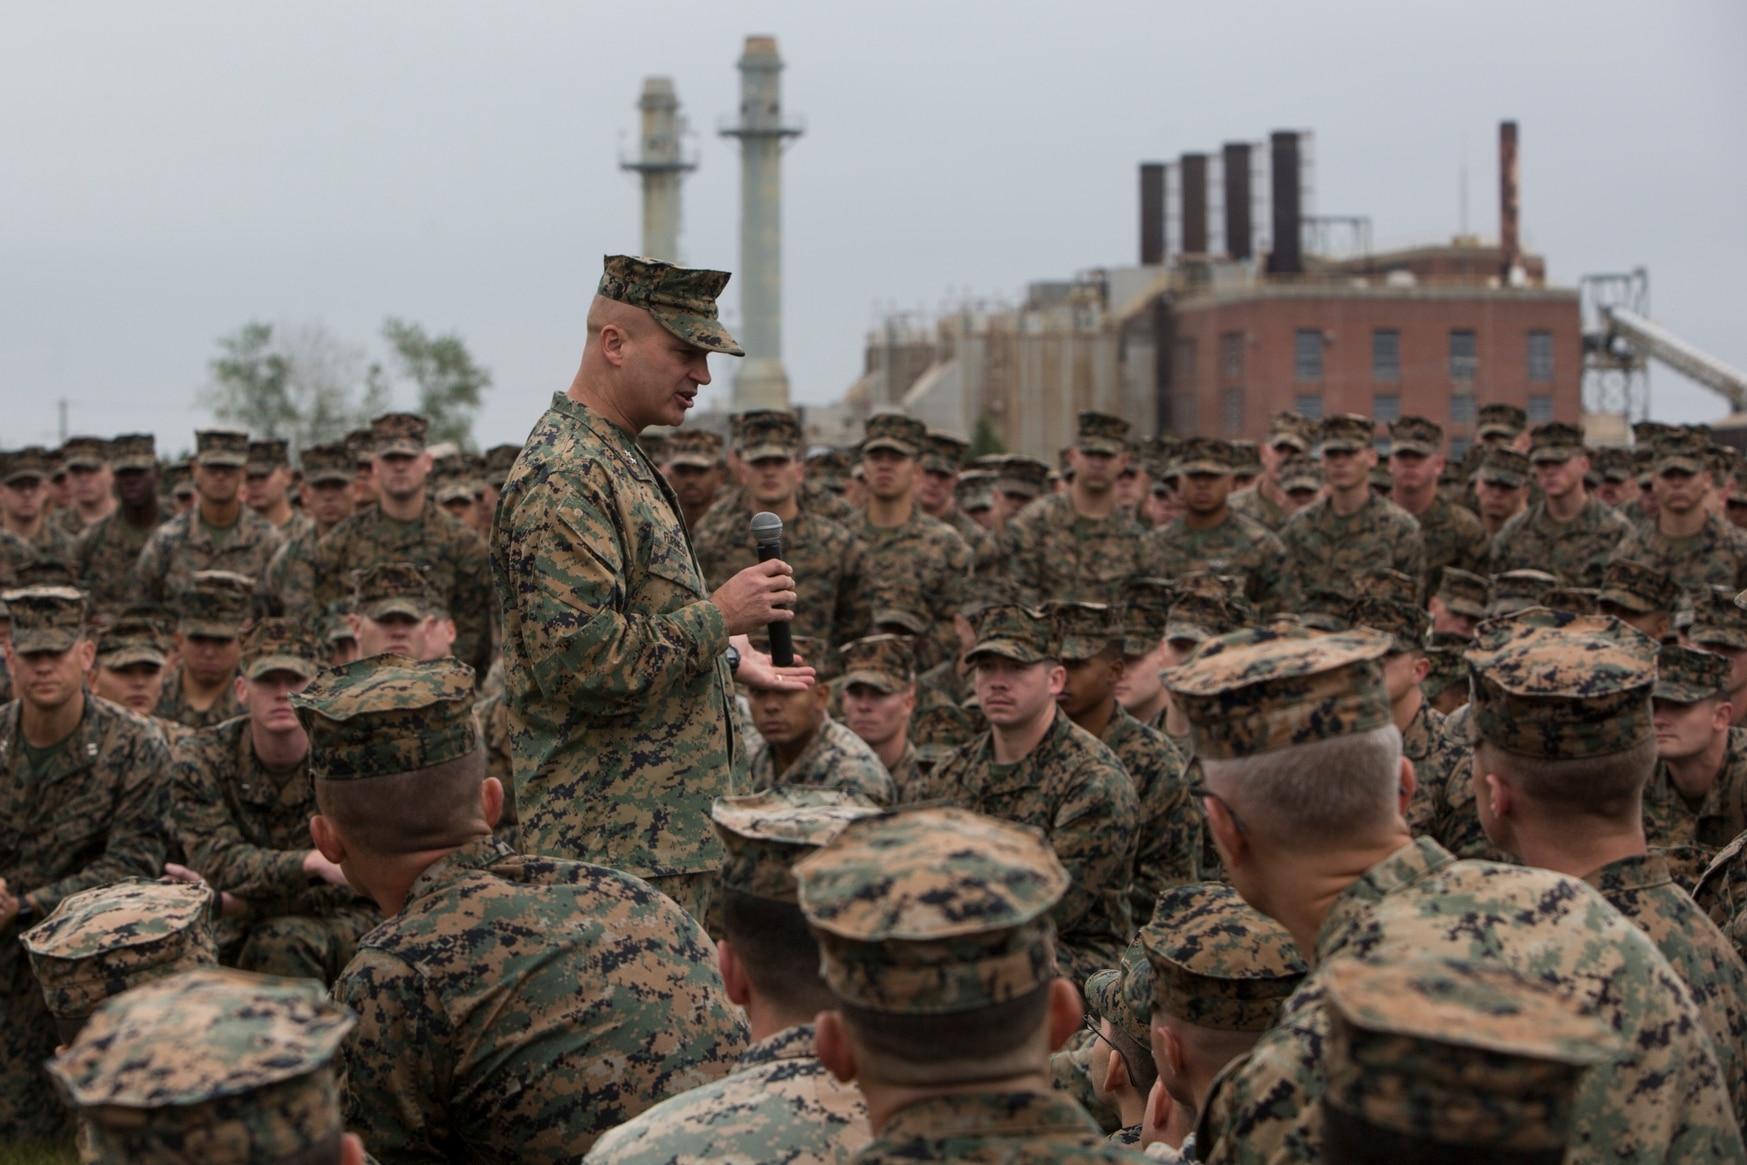 Maj. Gen. David Furness, the commanding general of 2nd Marine Division, addresses 6th Marine Regiment, 2nd Marine Division, during an award ceremony for Regiment Week on Camp Lejeune, North Carolina, Nov. 9, 2018. (Cpl. Christian J. Robertson/Marine Corps)